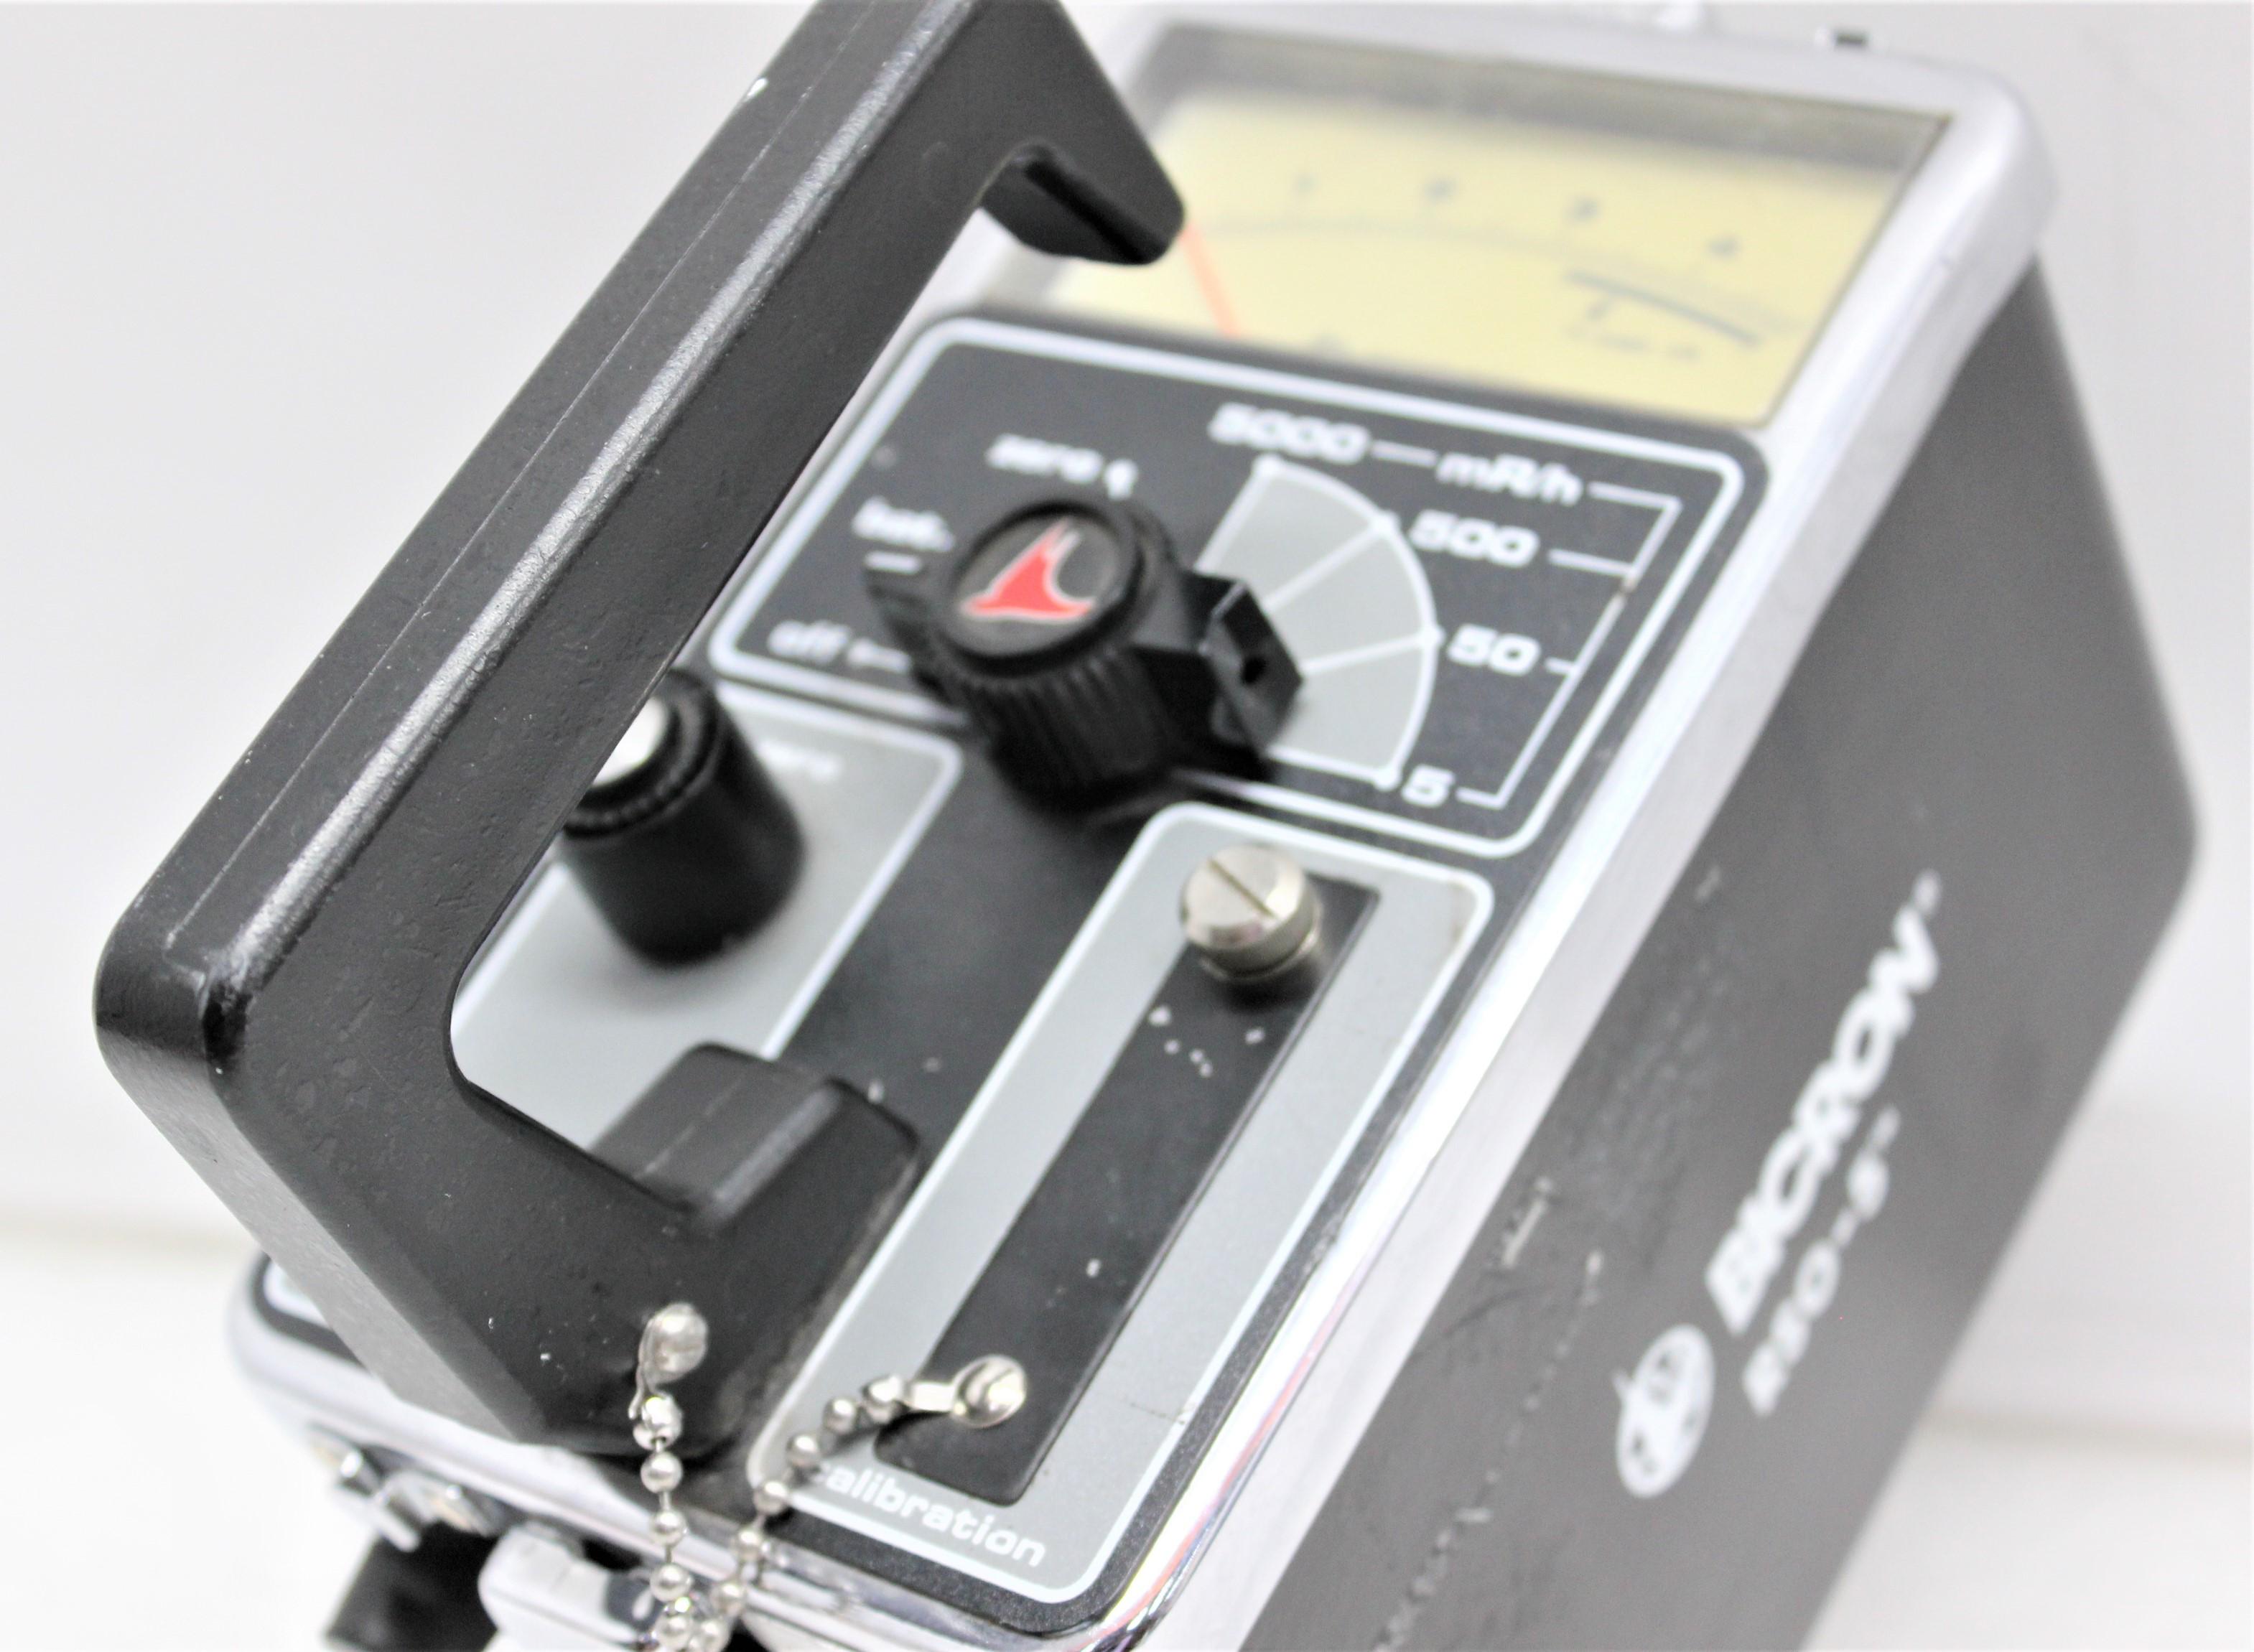 Image BICRON RSO-5 Portable Survey Meter 1587248